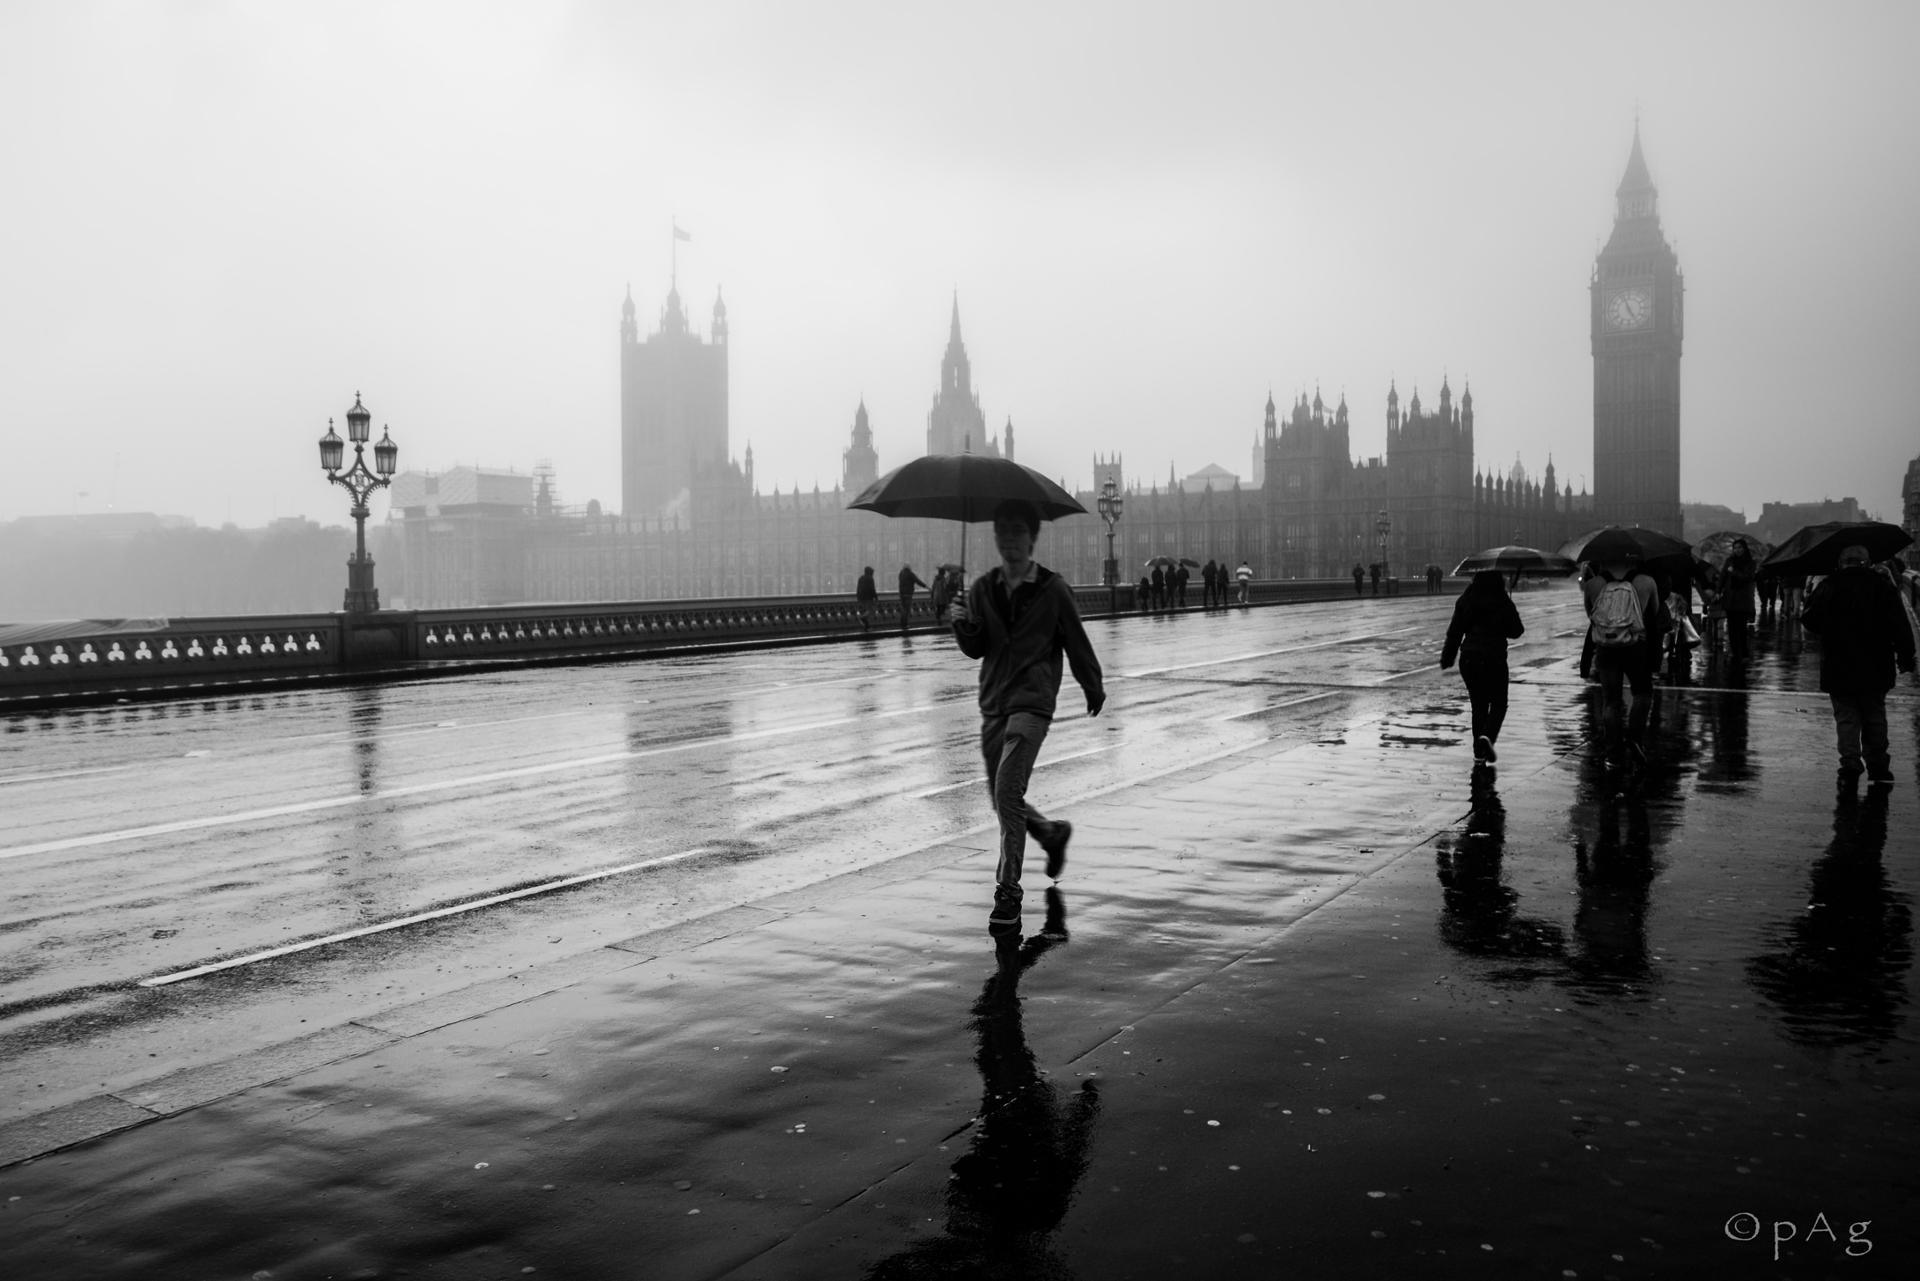 Rain on London